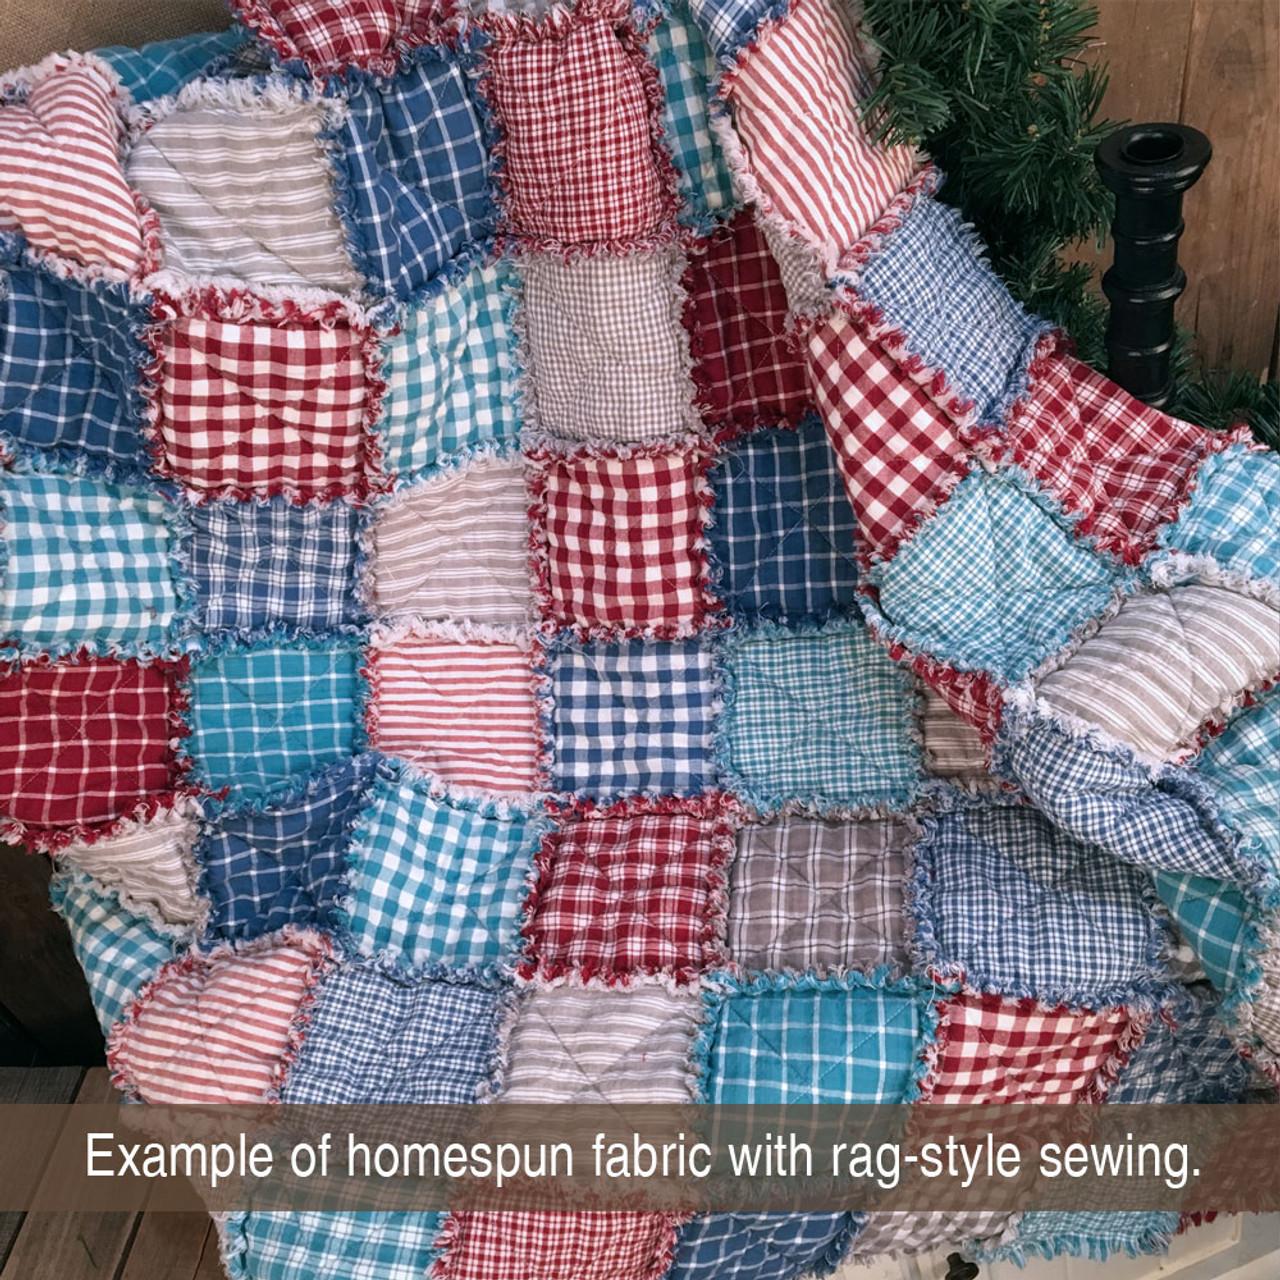 Liberty Red 6 Homespun Cotton Fabric